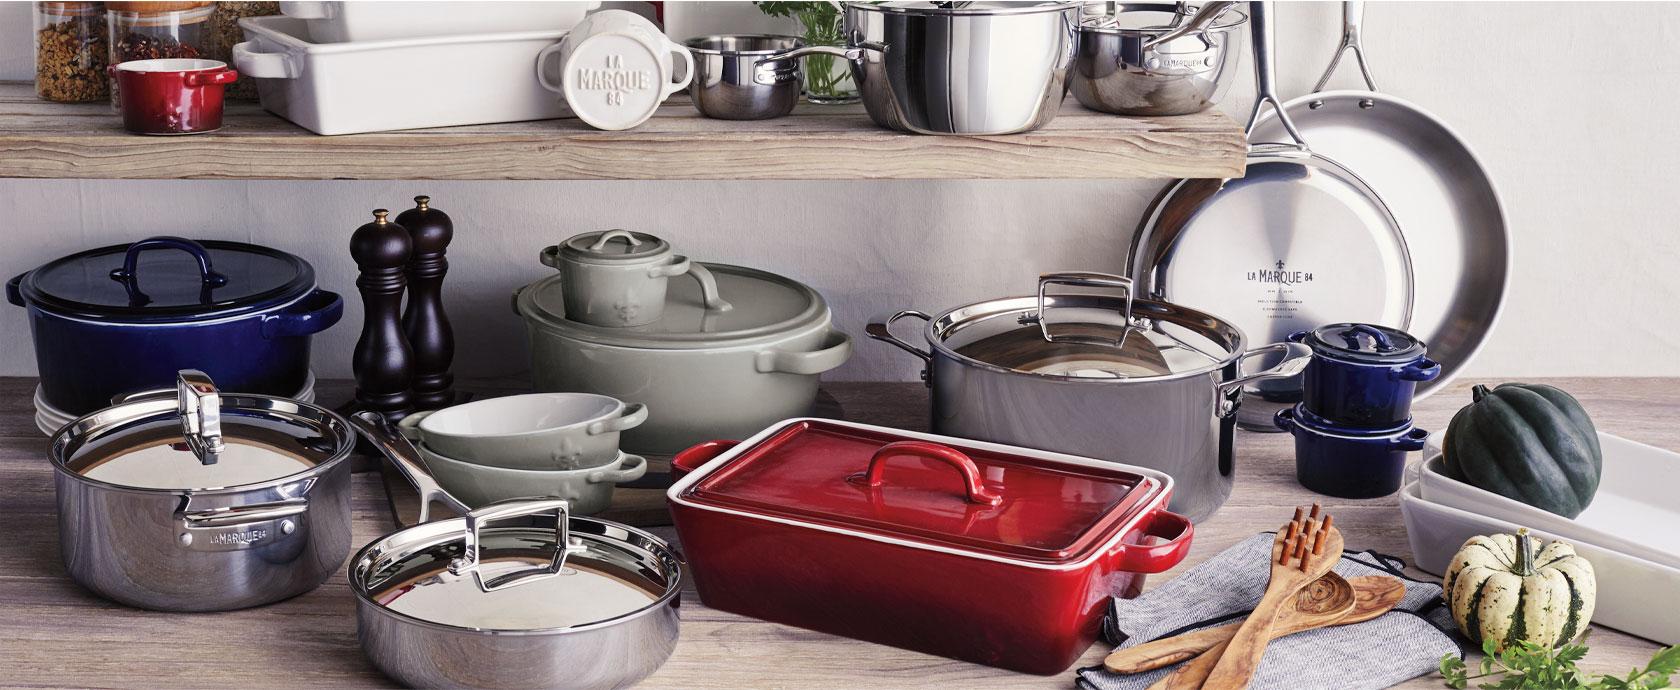 La Marque 84 cookware